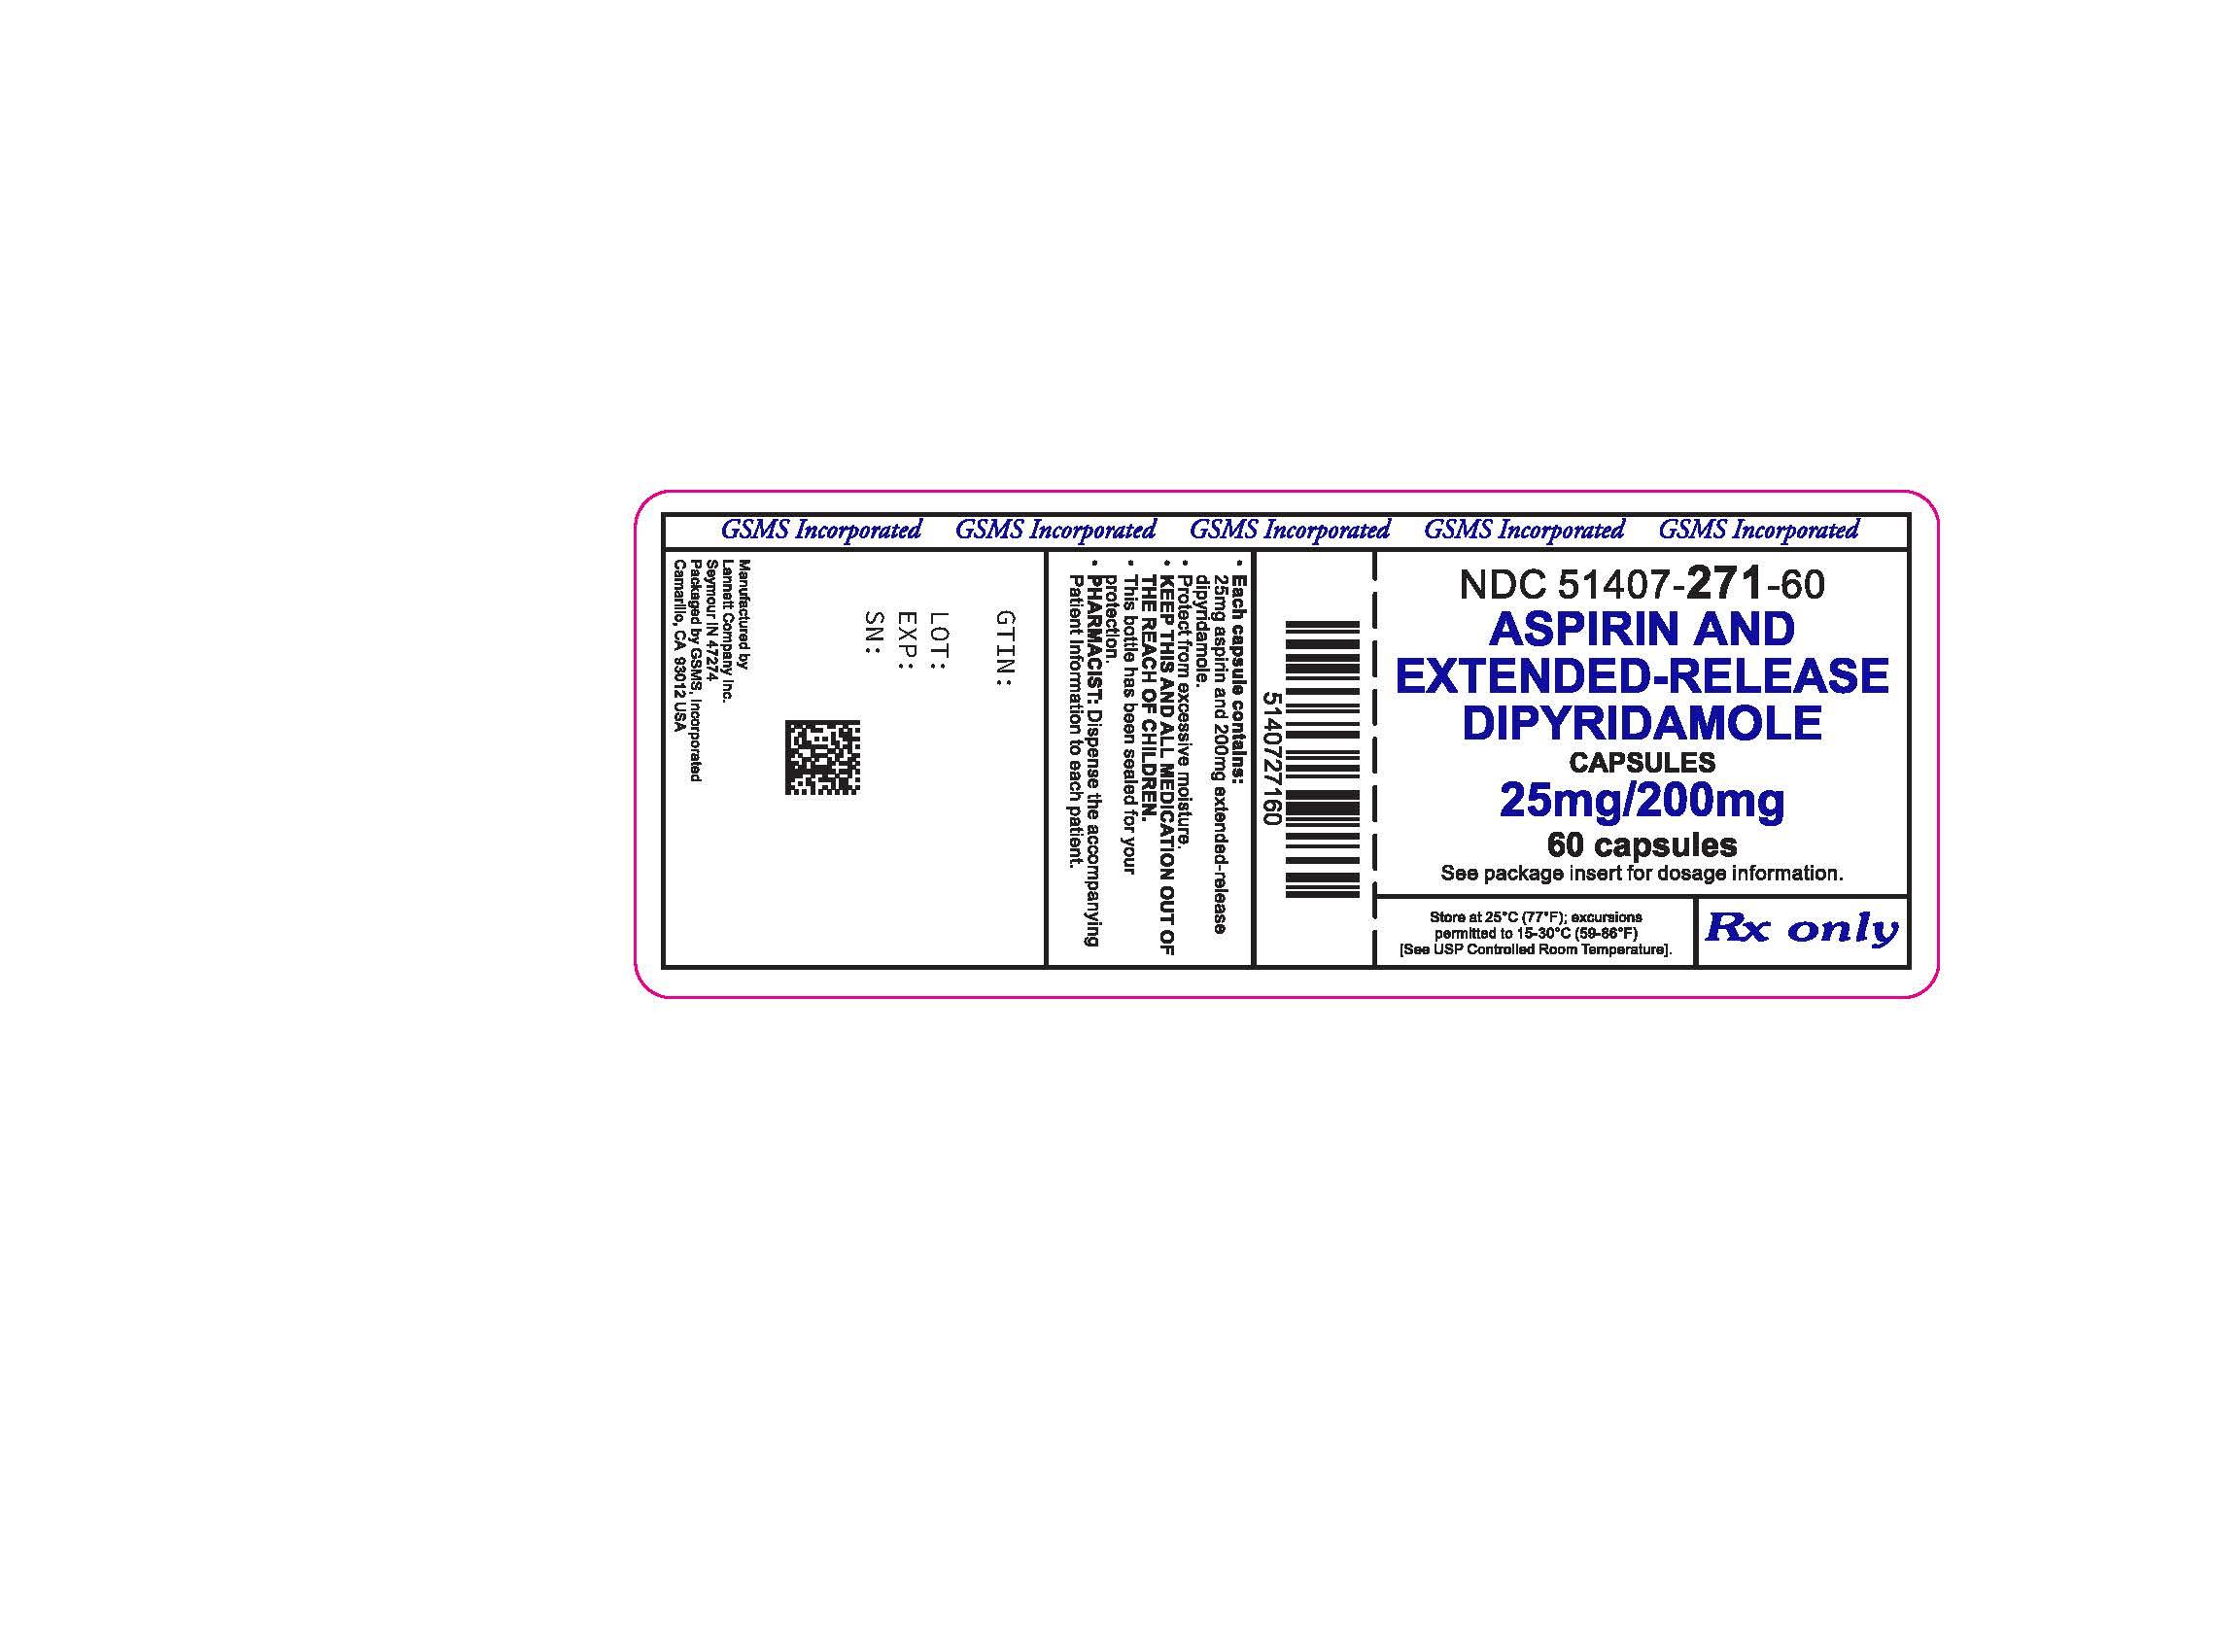 51407-271-60LB - ASPIRIN AND DIPYRIDAMOLE 25MG-200 MG ER CAPS.jpg